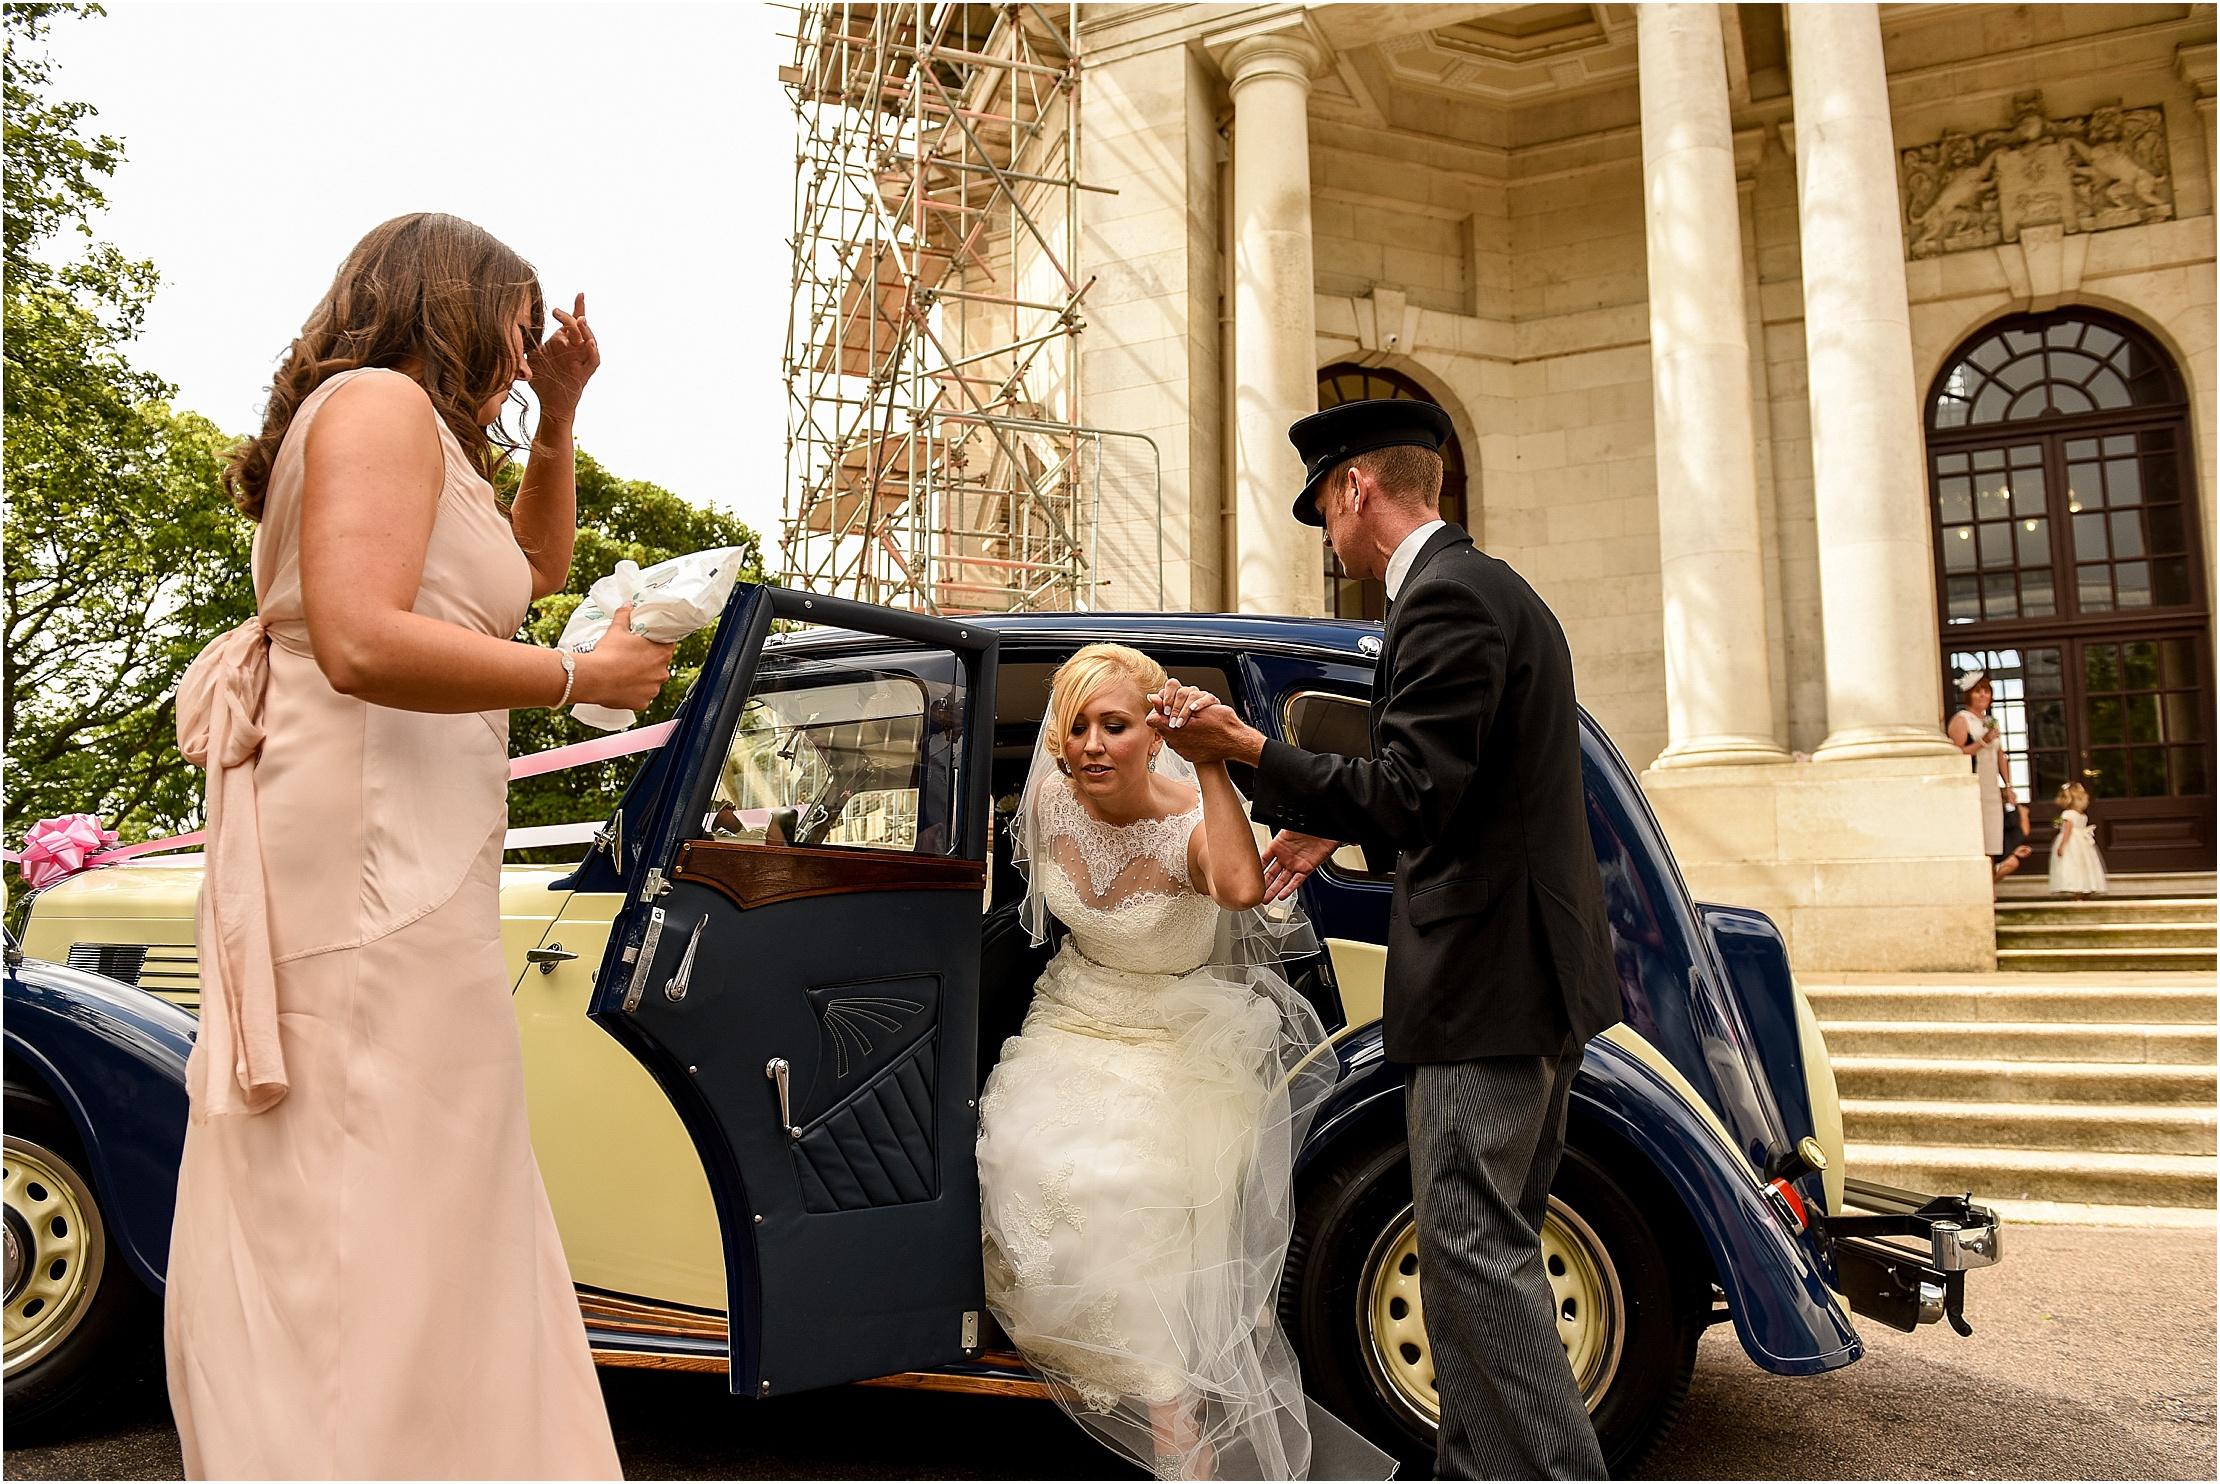 staining-lodge-wedding-045.jpg